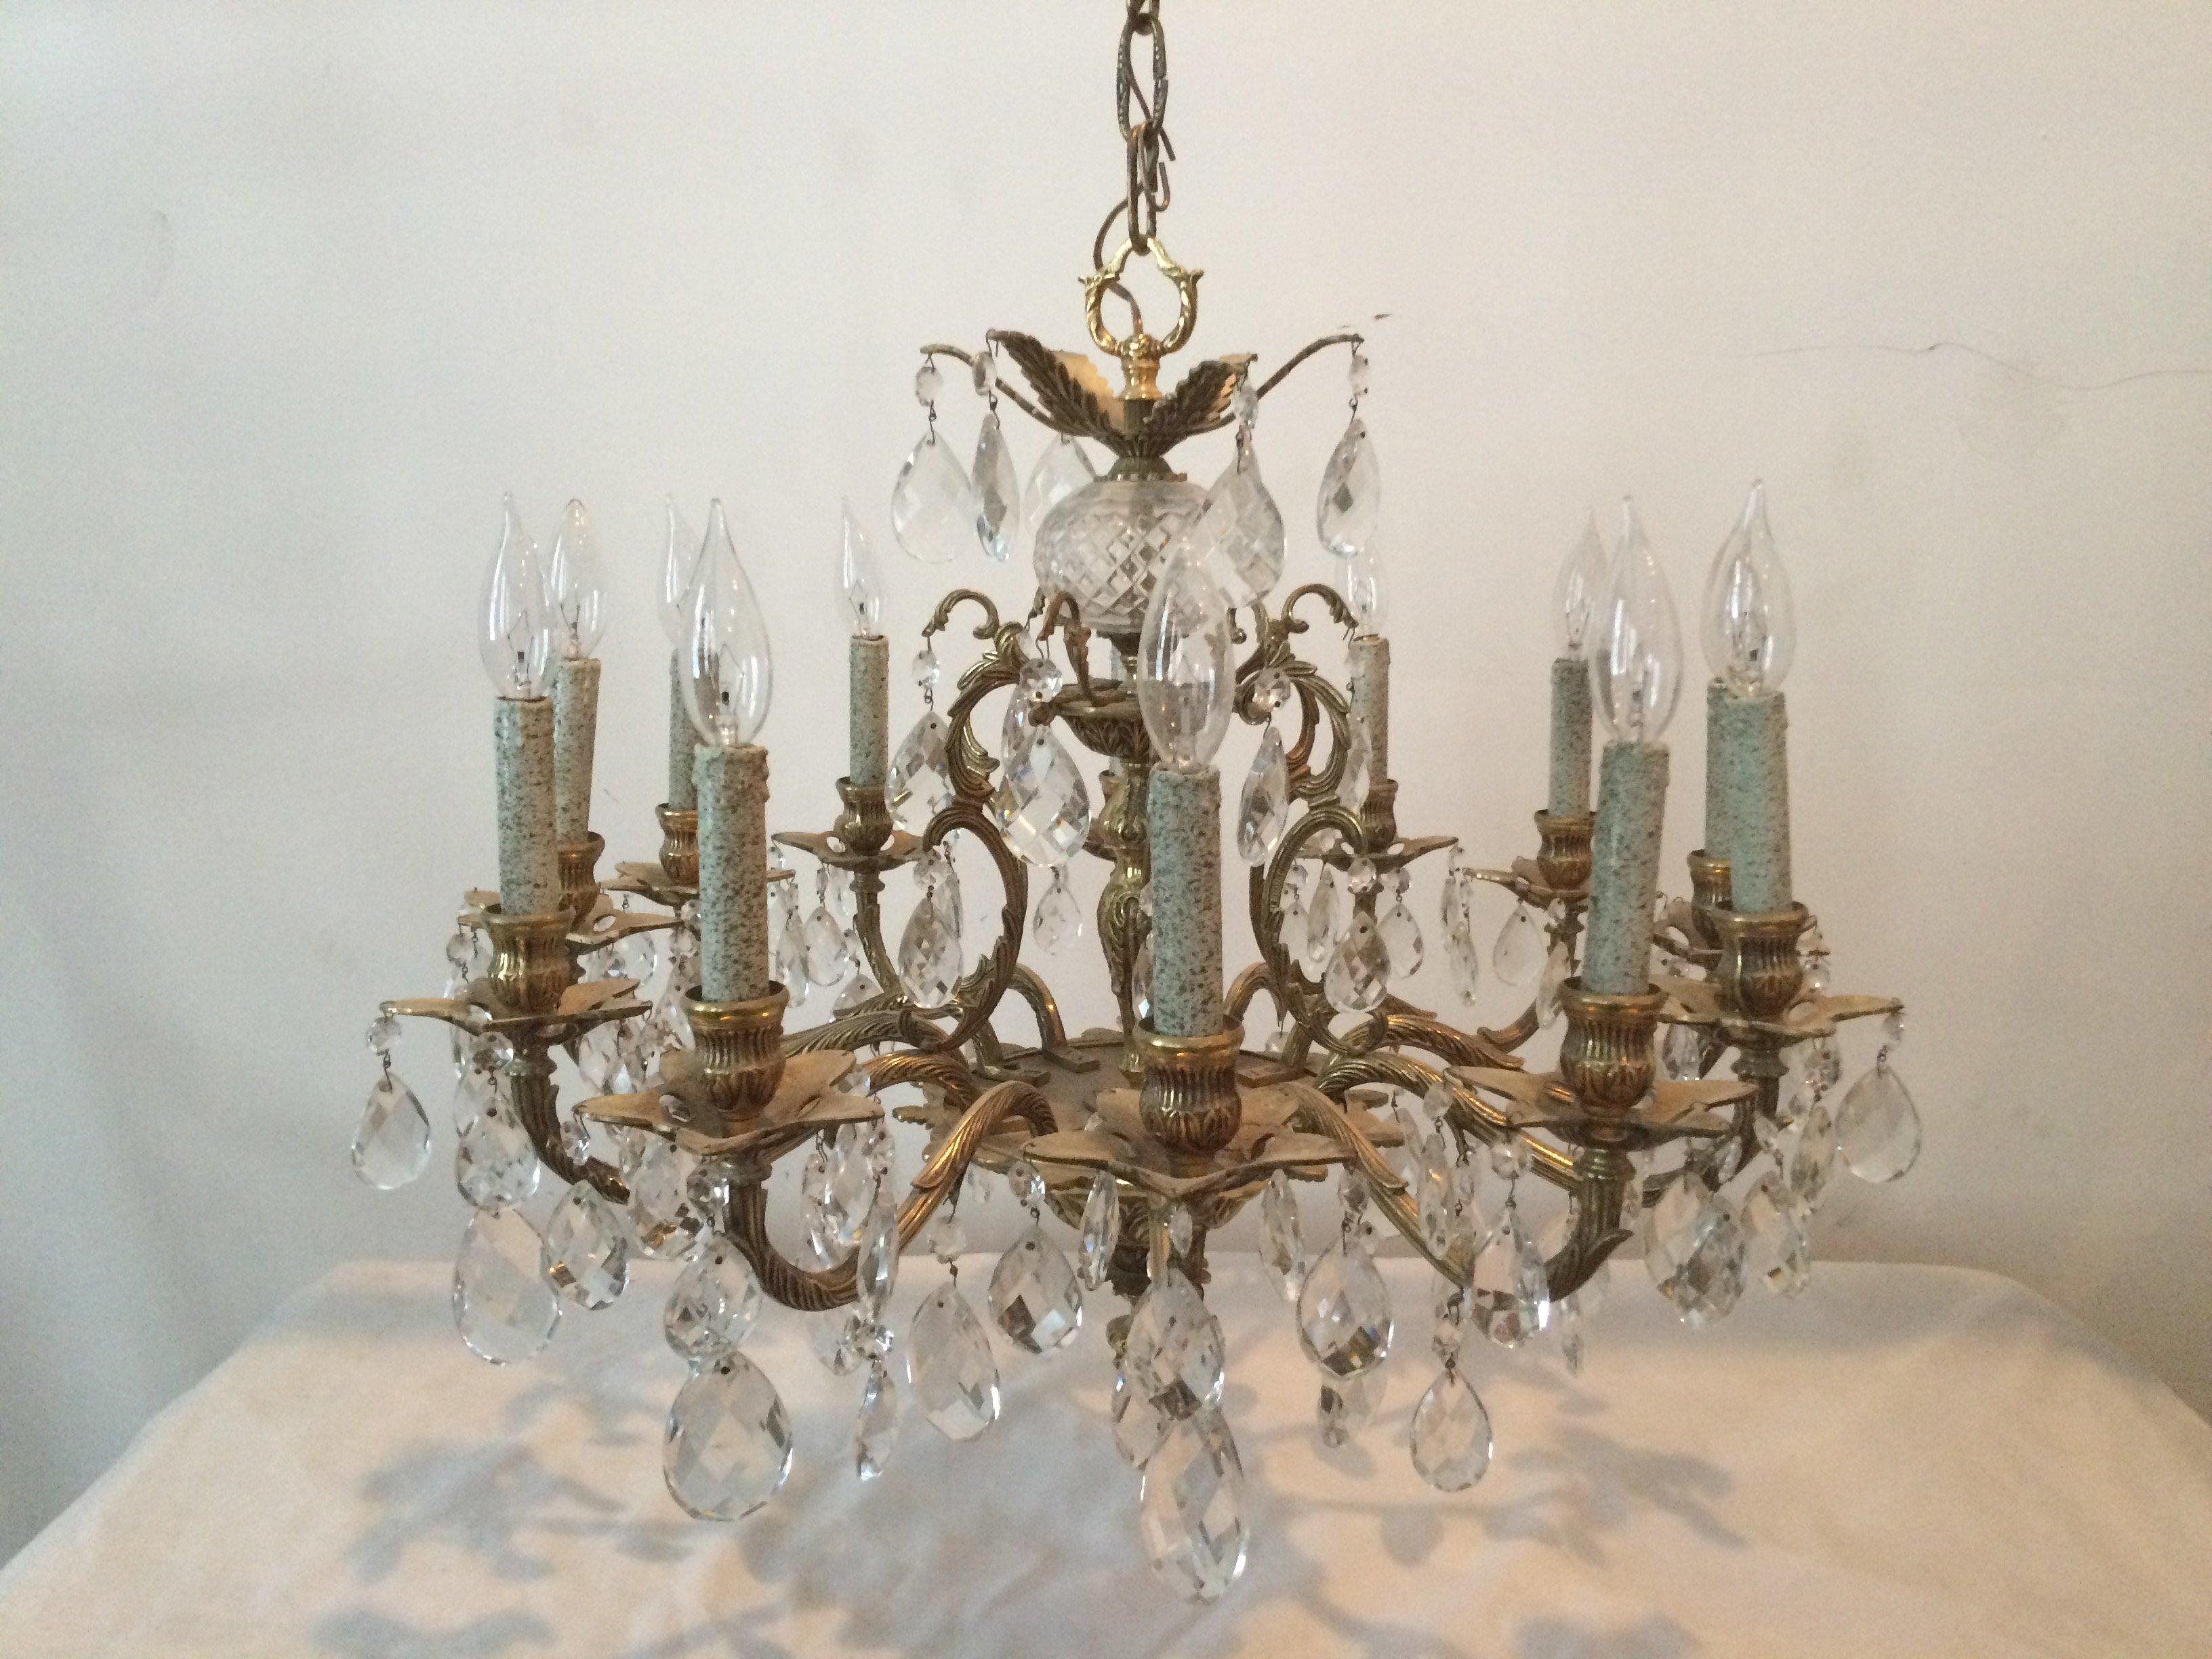 Cosa s Lighting & Furniture Chandeliers Gallery